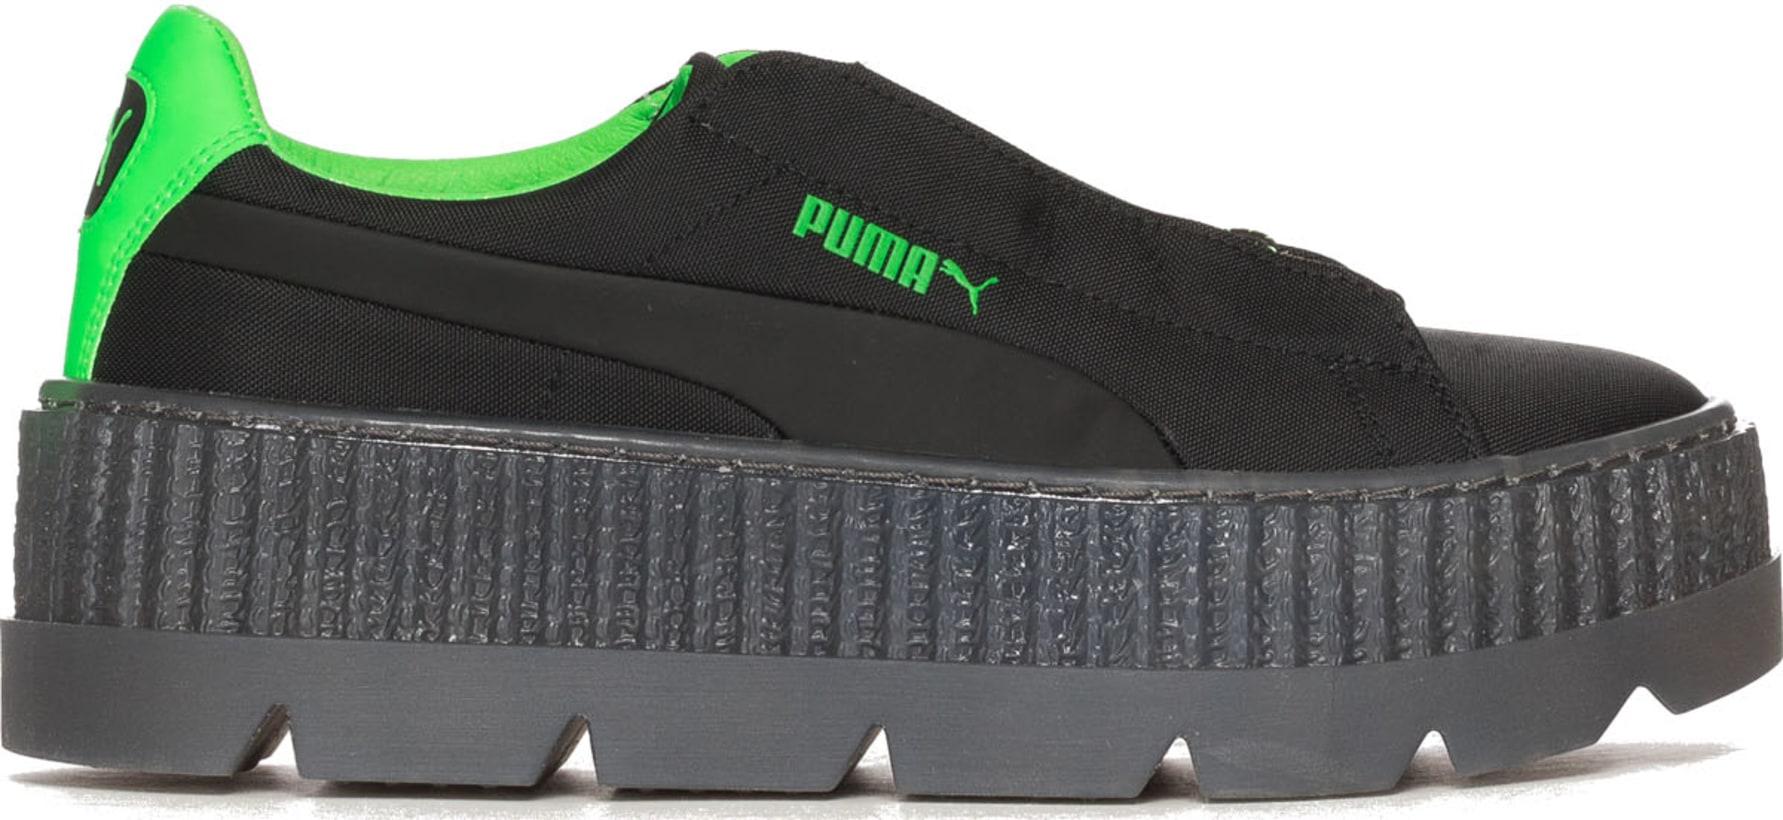 wholesale dealer d5293 eb037 Puma - Fenty Cleated Creeper Surf - Black/Green Gecko